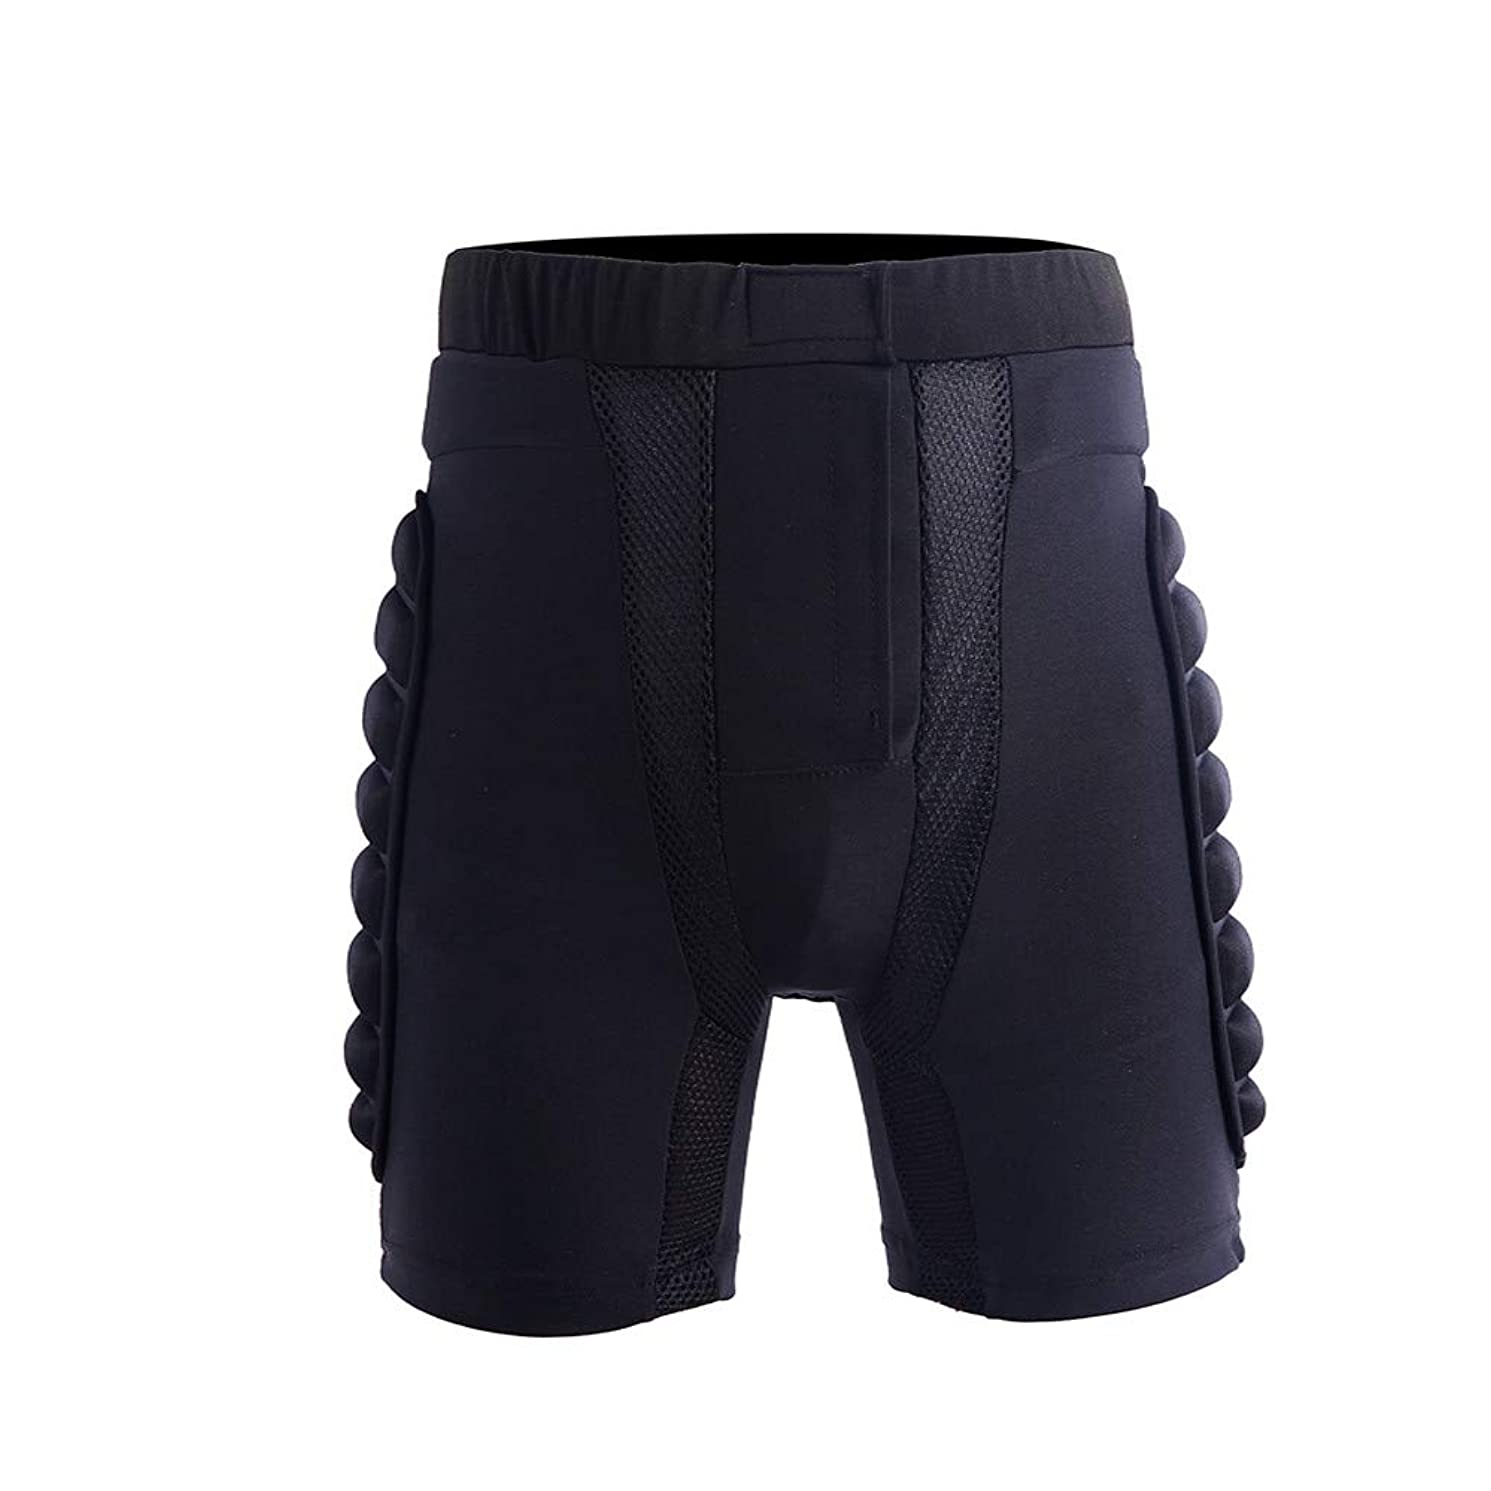 Men's Optimum Bike Shorts ,Men's Cycling Riding 3D GEL Padded Shorts Bicycle Wear